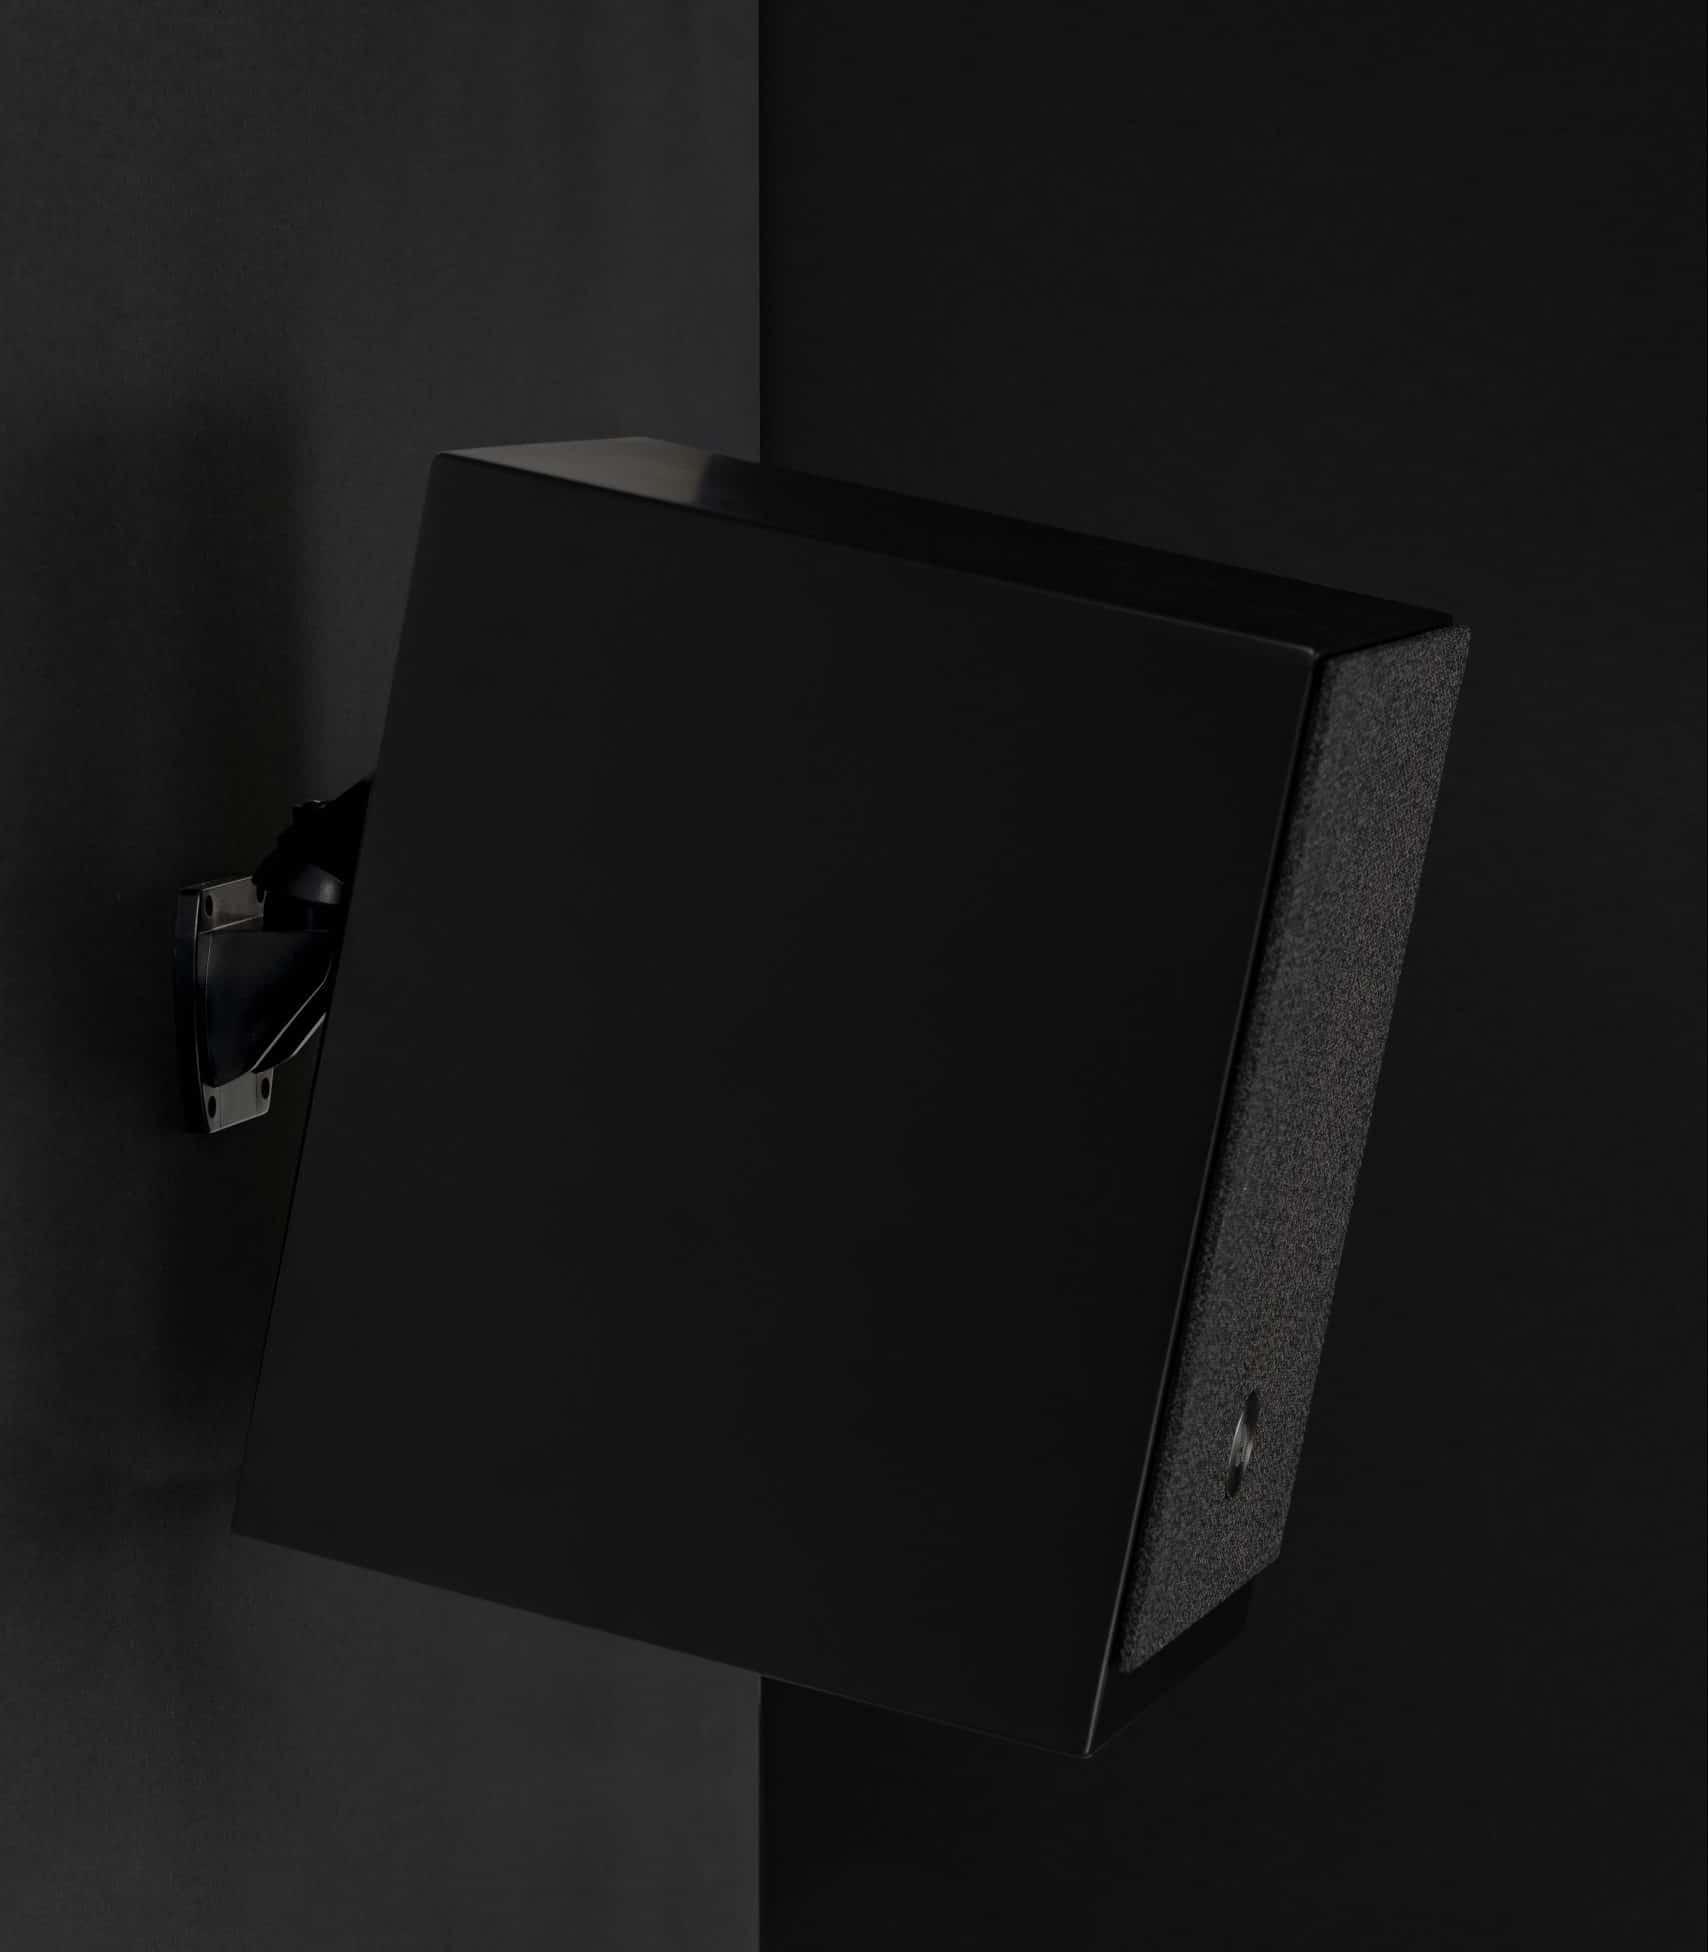 wireless multiroom speaker A26 black Lifestyle AudioPro 02 scaled e1603111974832